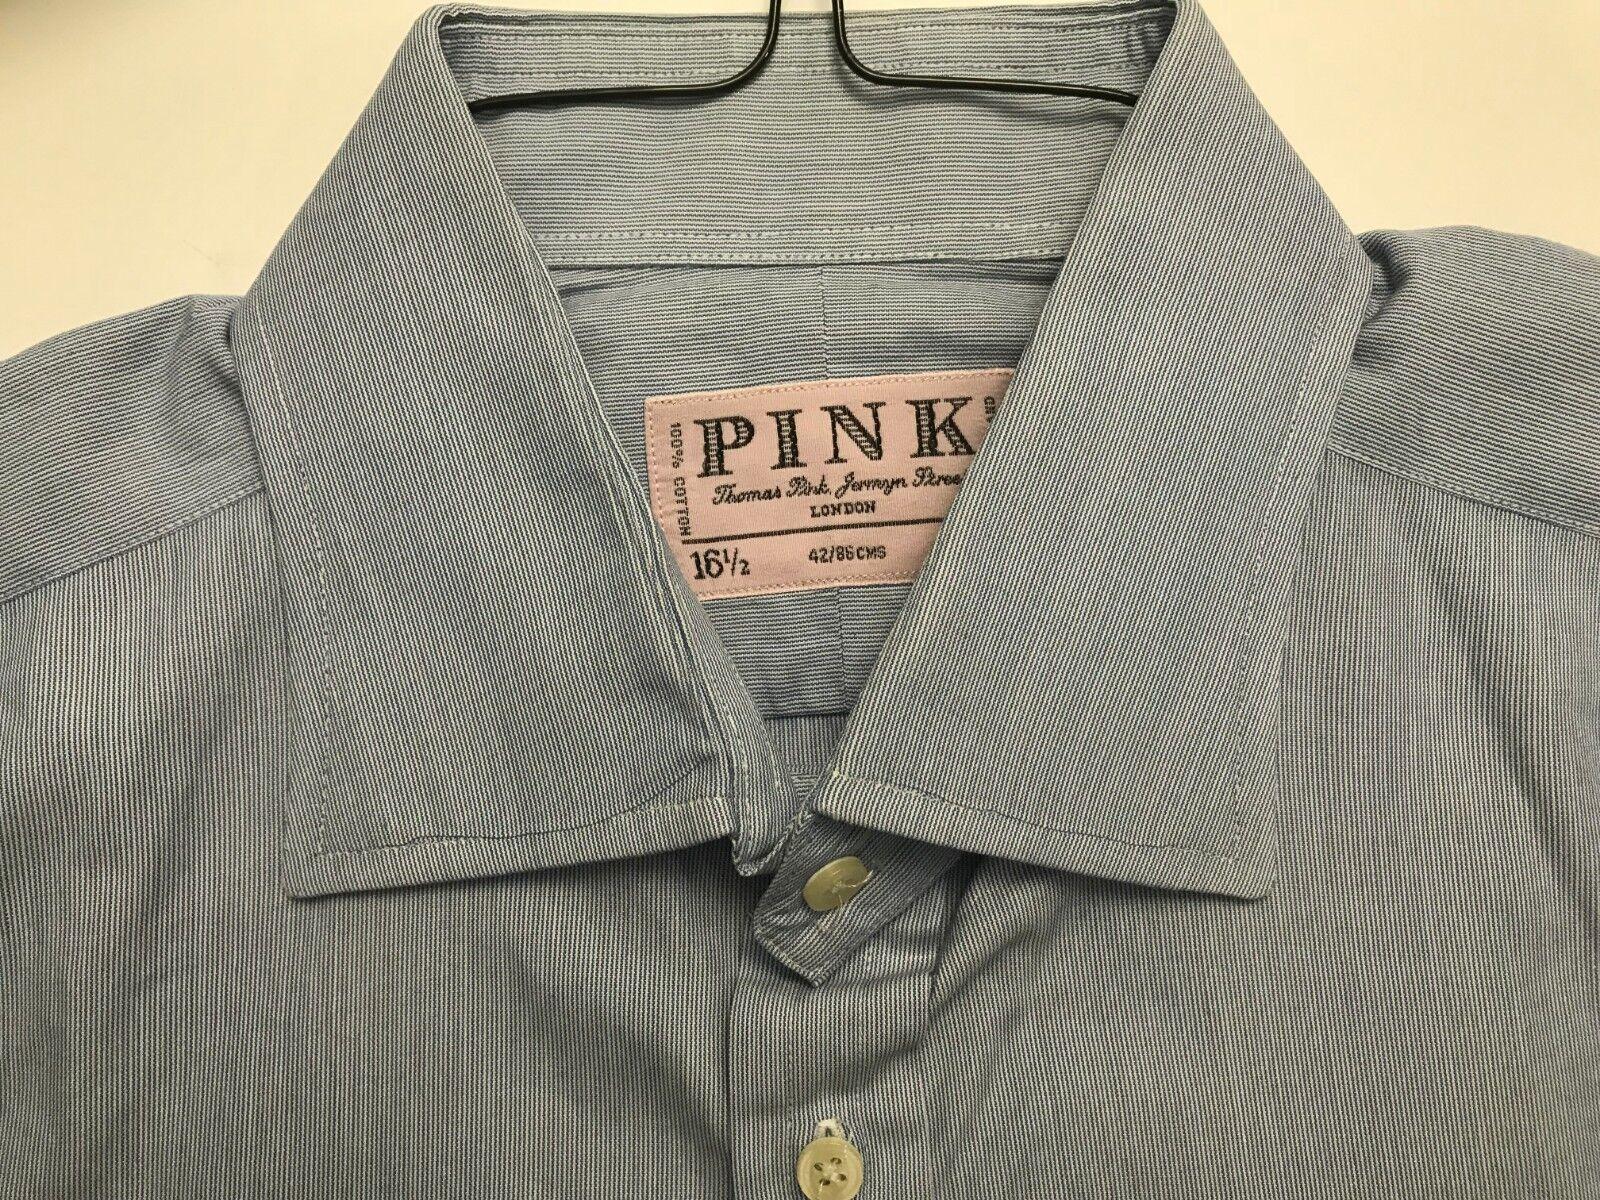 THOMAS PINK LONDON blueE STRIPED 100% COTTON DRESS SHIRT MINT COND SZ 16.5 X 34